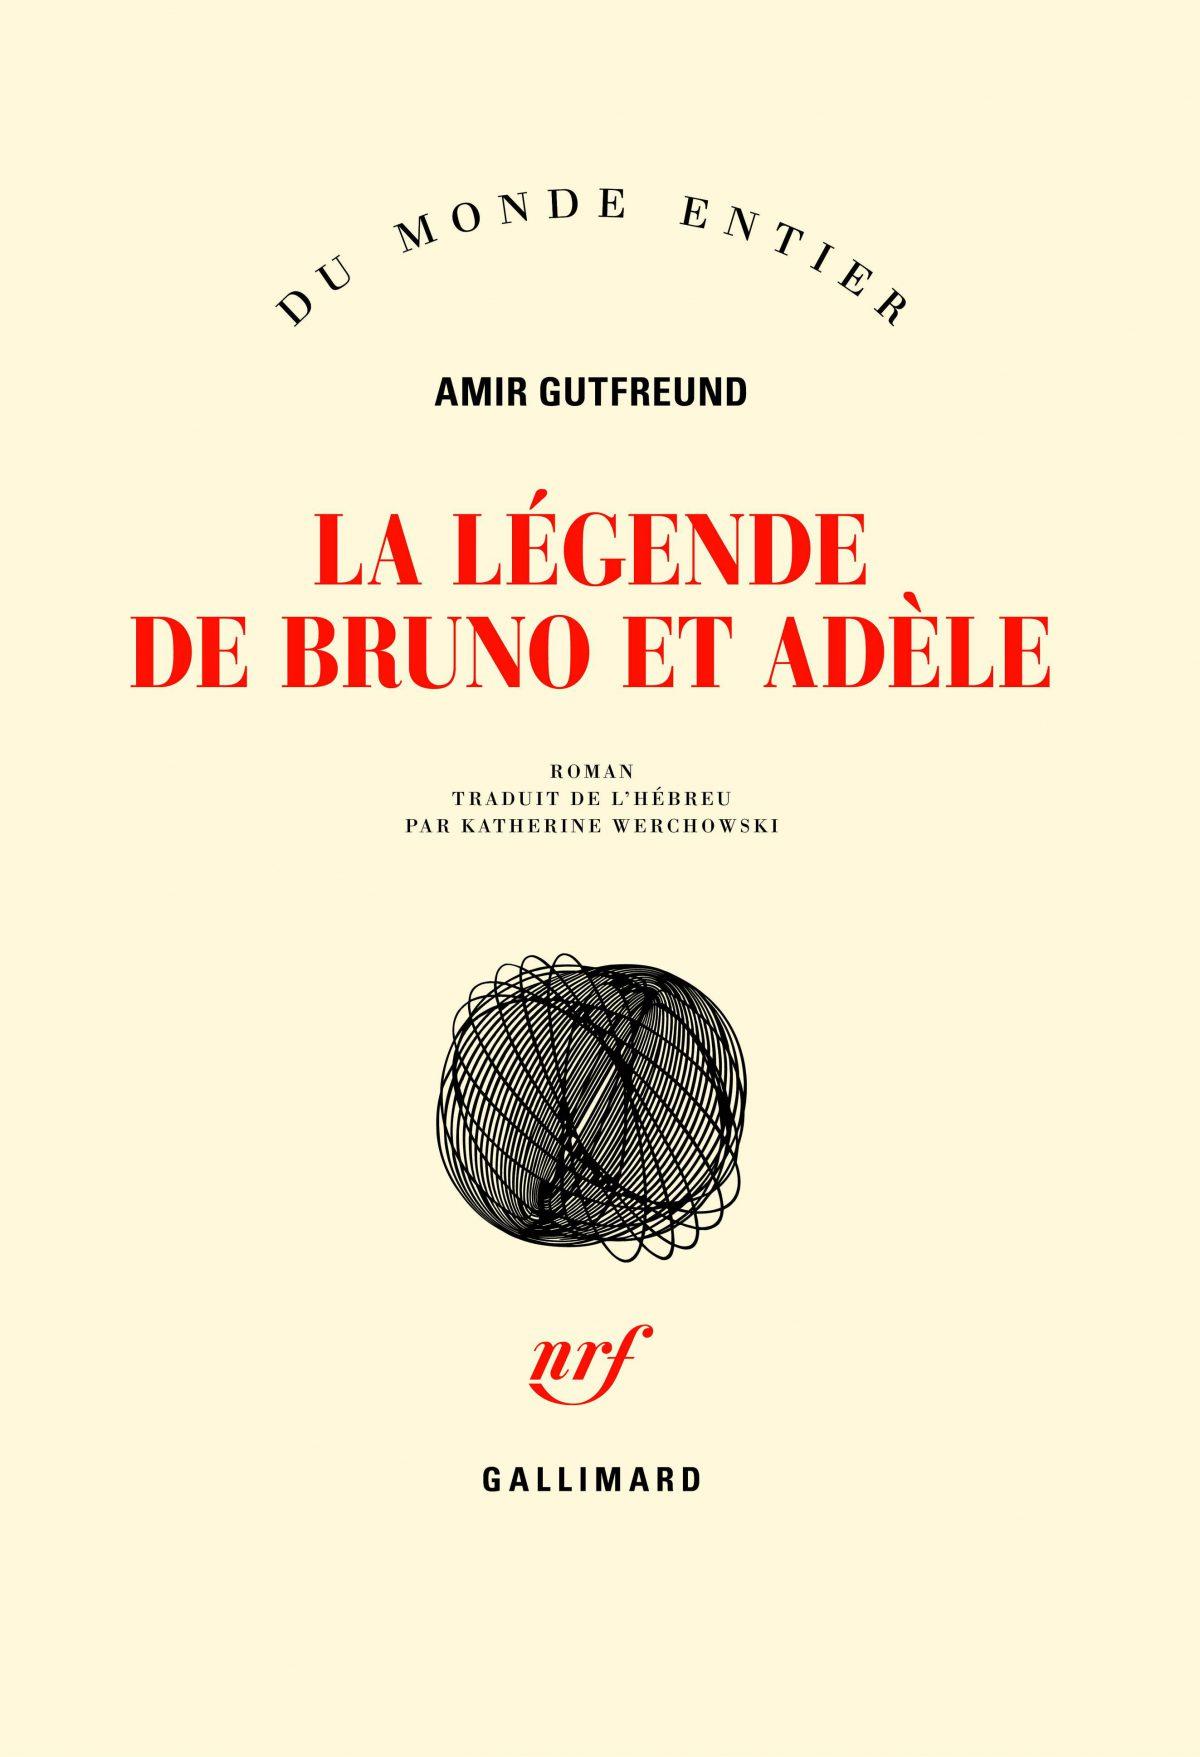 La légende de Bruno et Adèle, Amir Guthfreund.